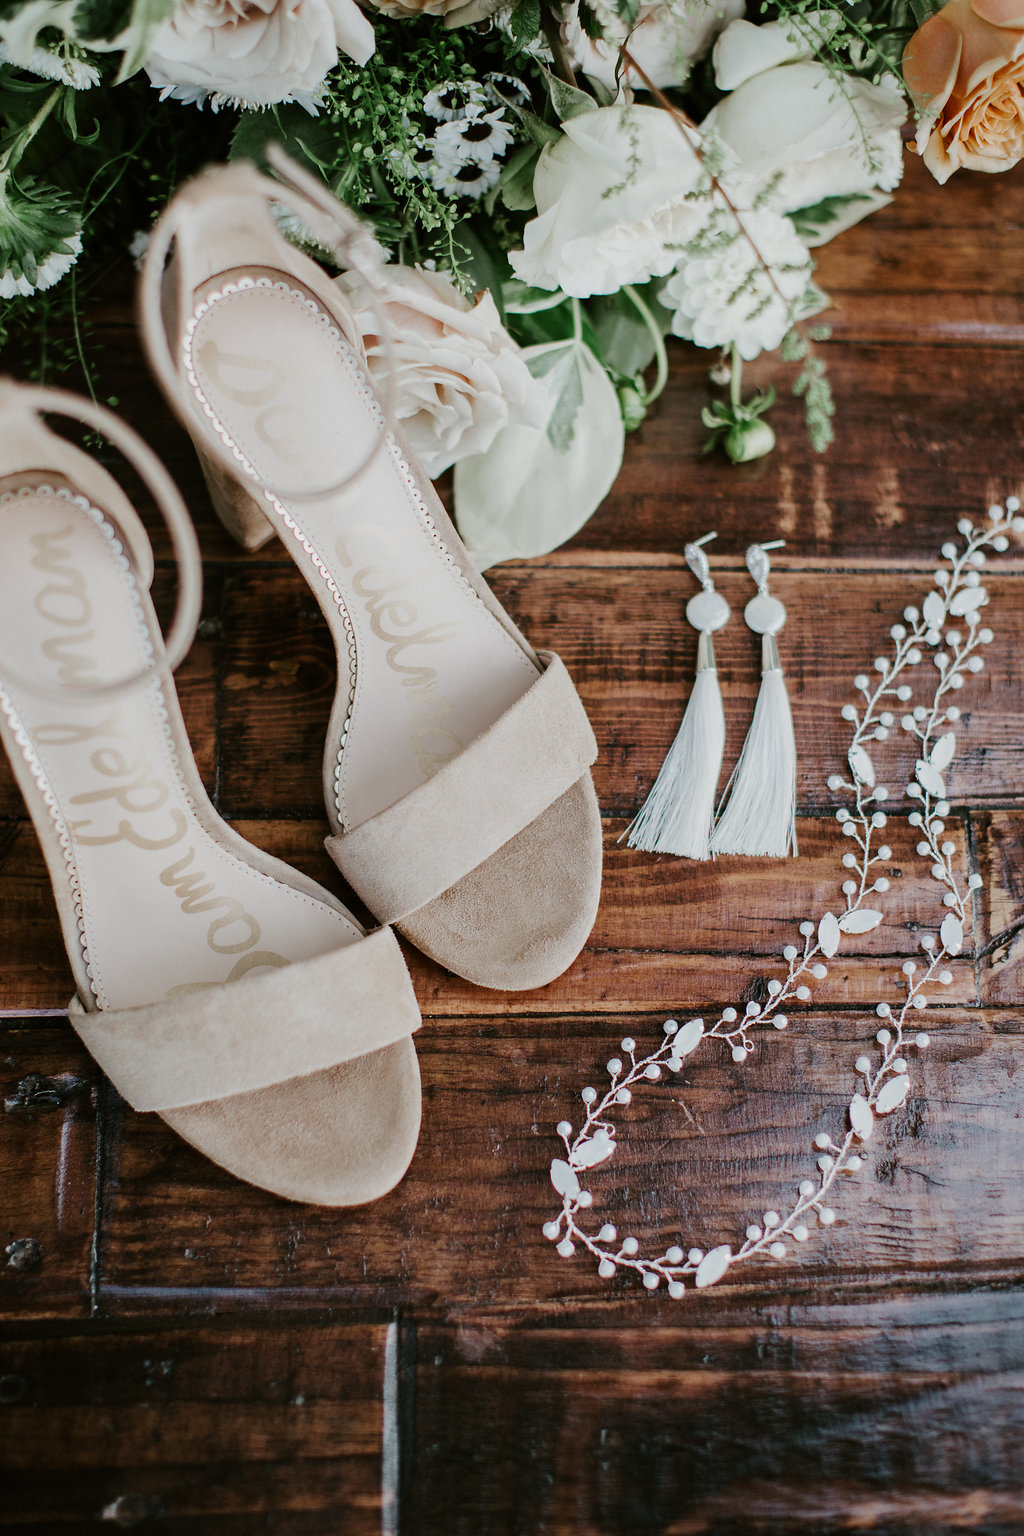 Boho Bridal Earrings, Boho bridal Accessories, Boho wedding, Bridal Halo, Champagne and GRIT - Copy.jpg